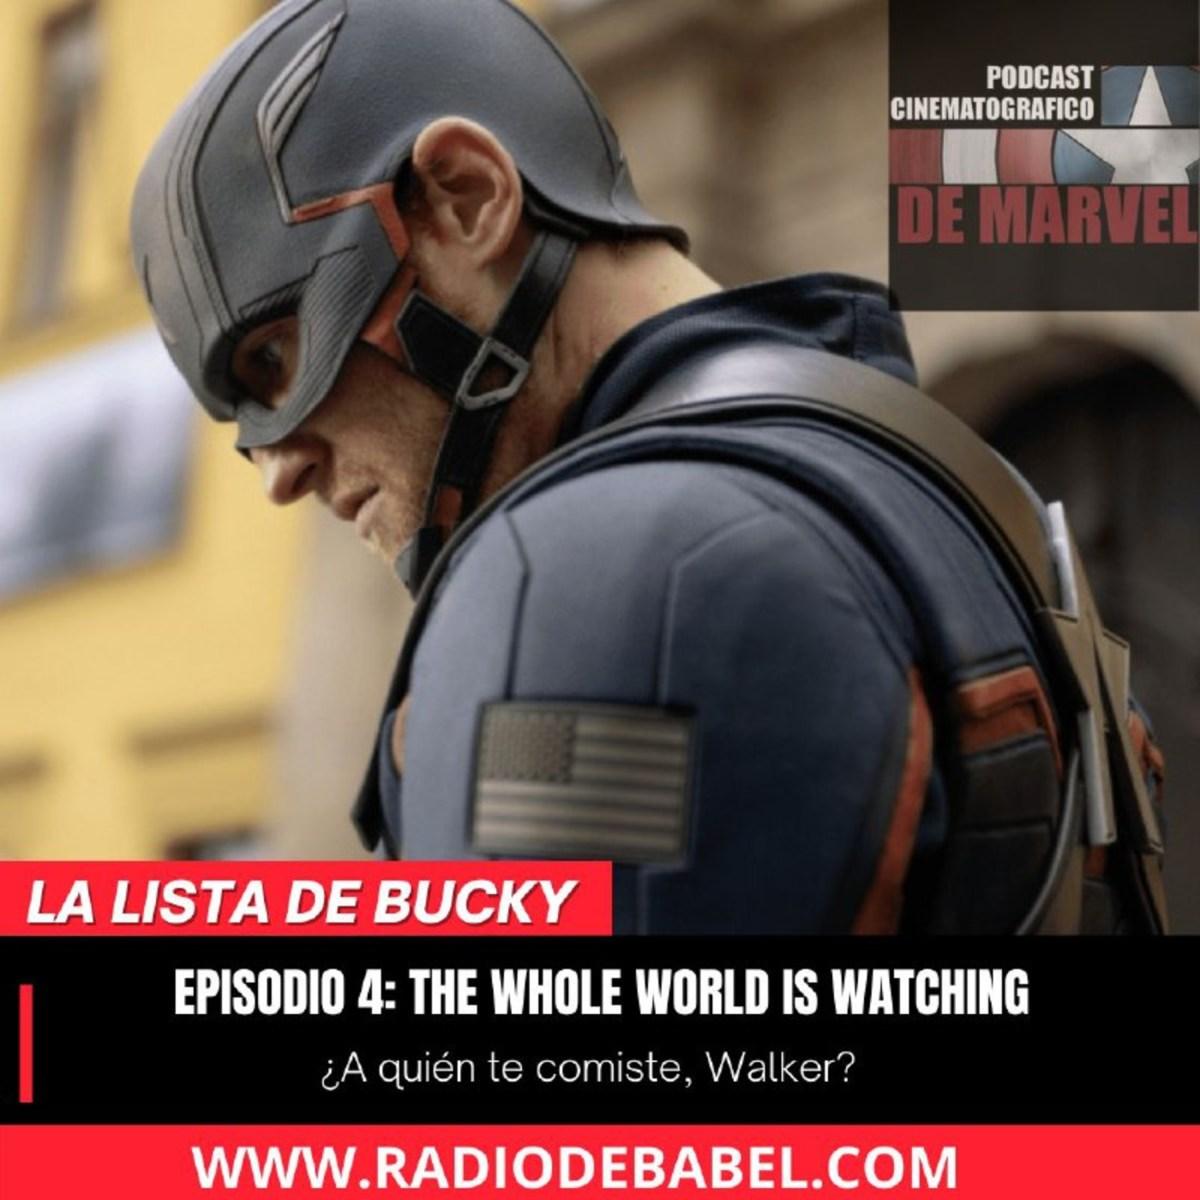 La Lista de Bucky: Guía Interactiva sobre Falcon and The Winter Soldier – Episodio 4